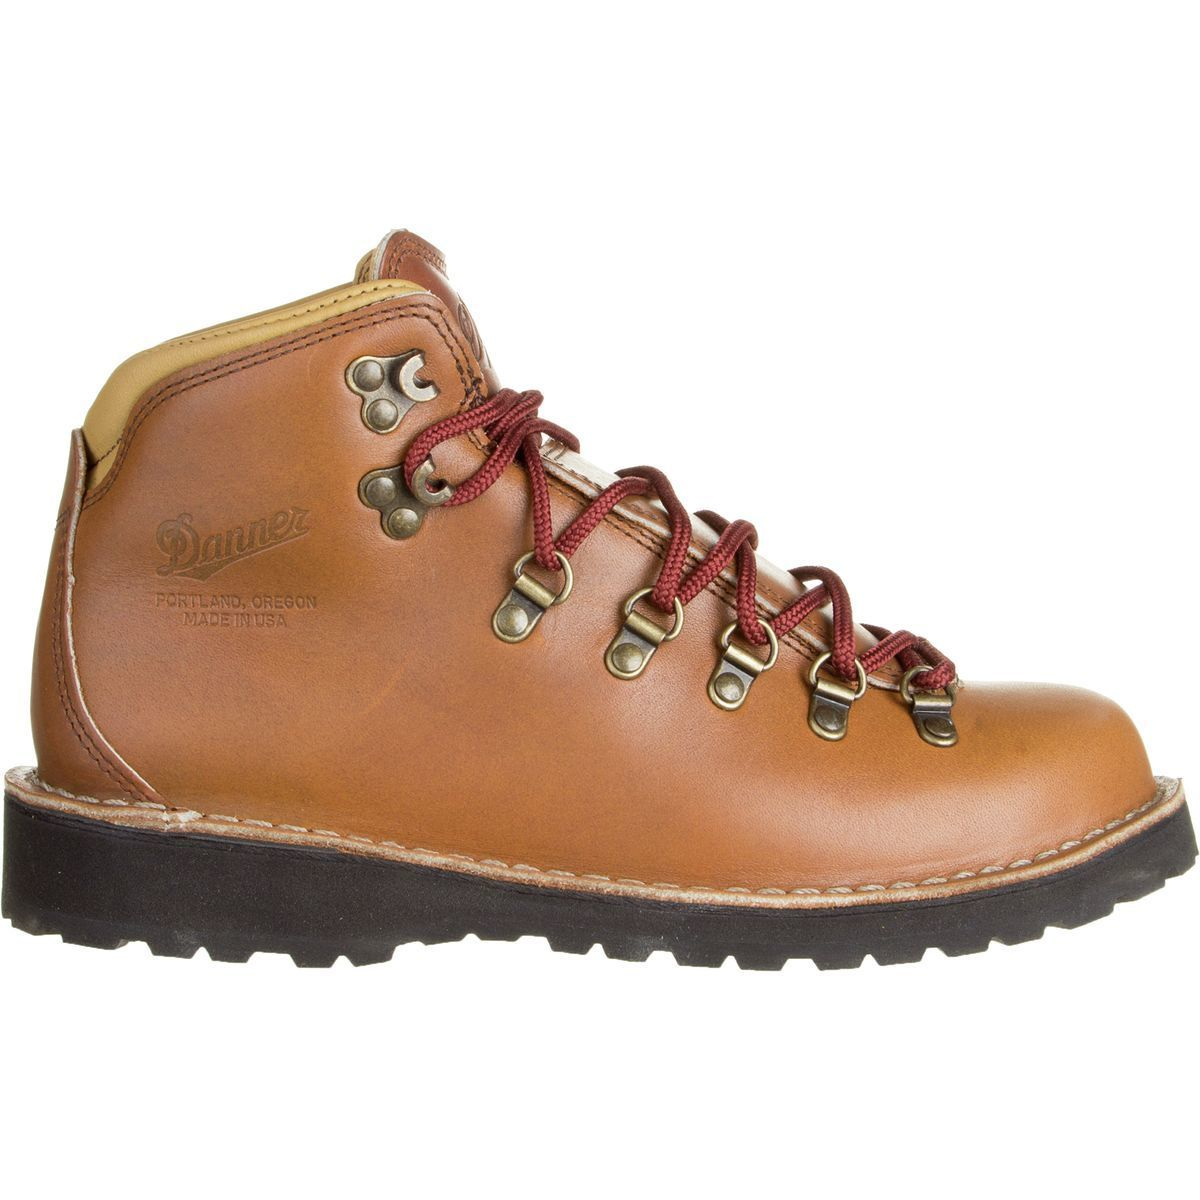 Danner Portland Select Mountain Pass Boot - Women's